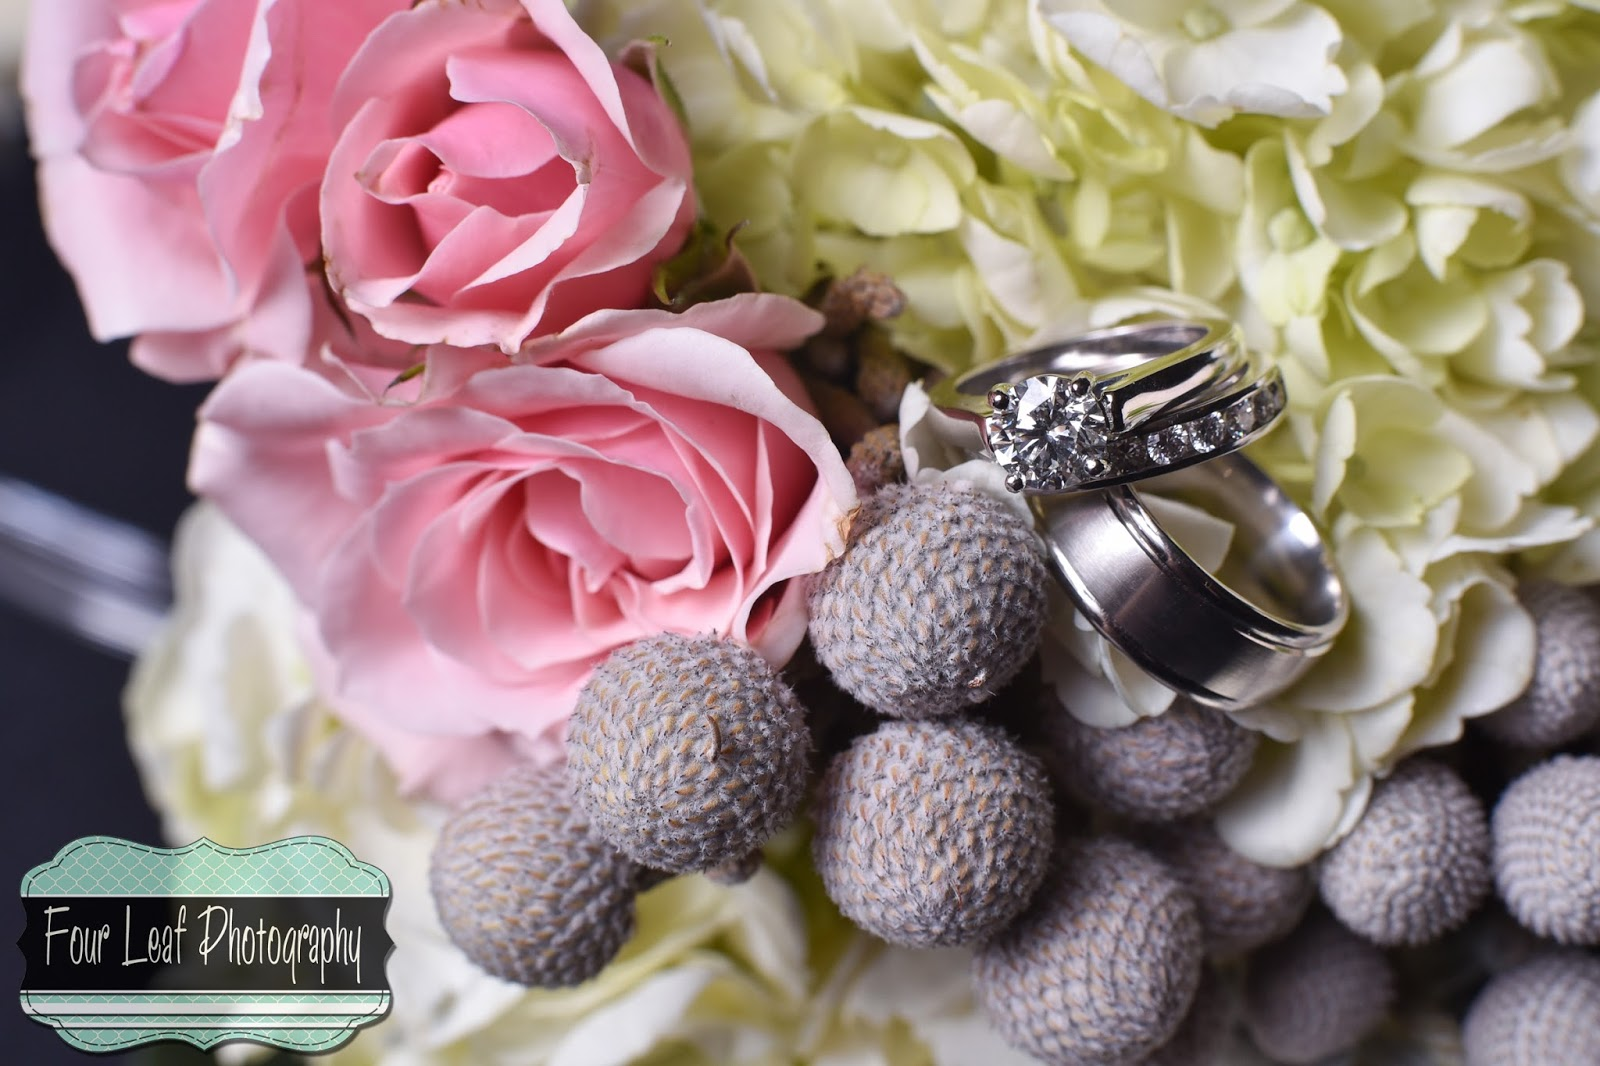 Four Leaf Photography - Louisville Wedding Photographer: January 2015